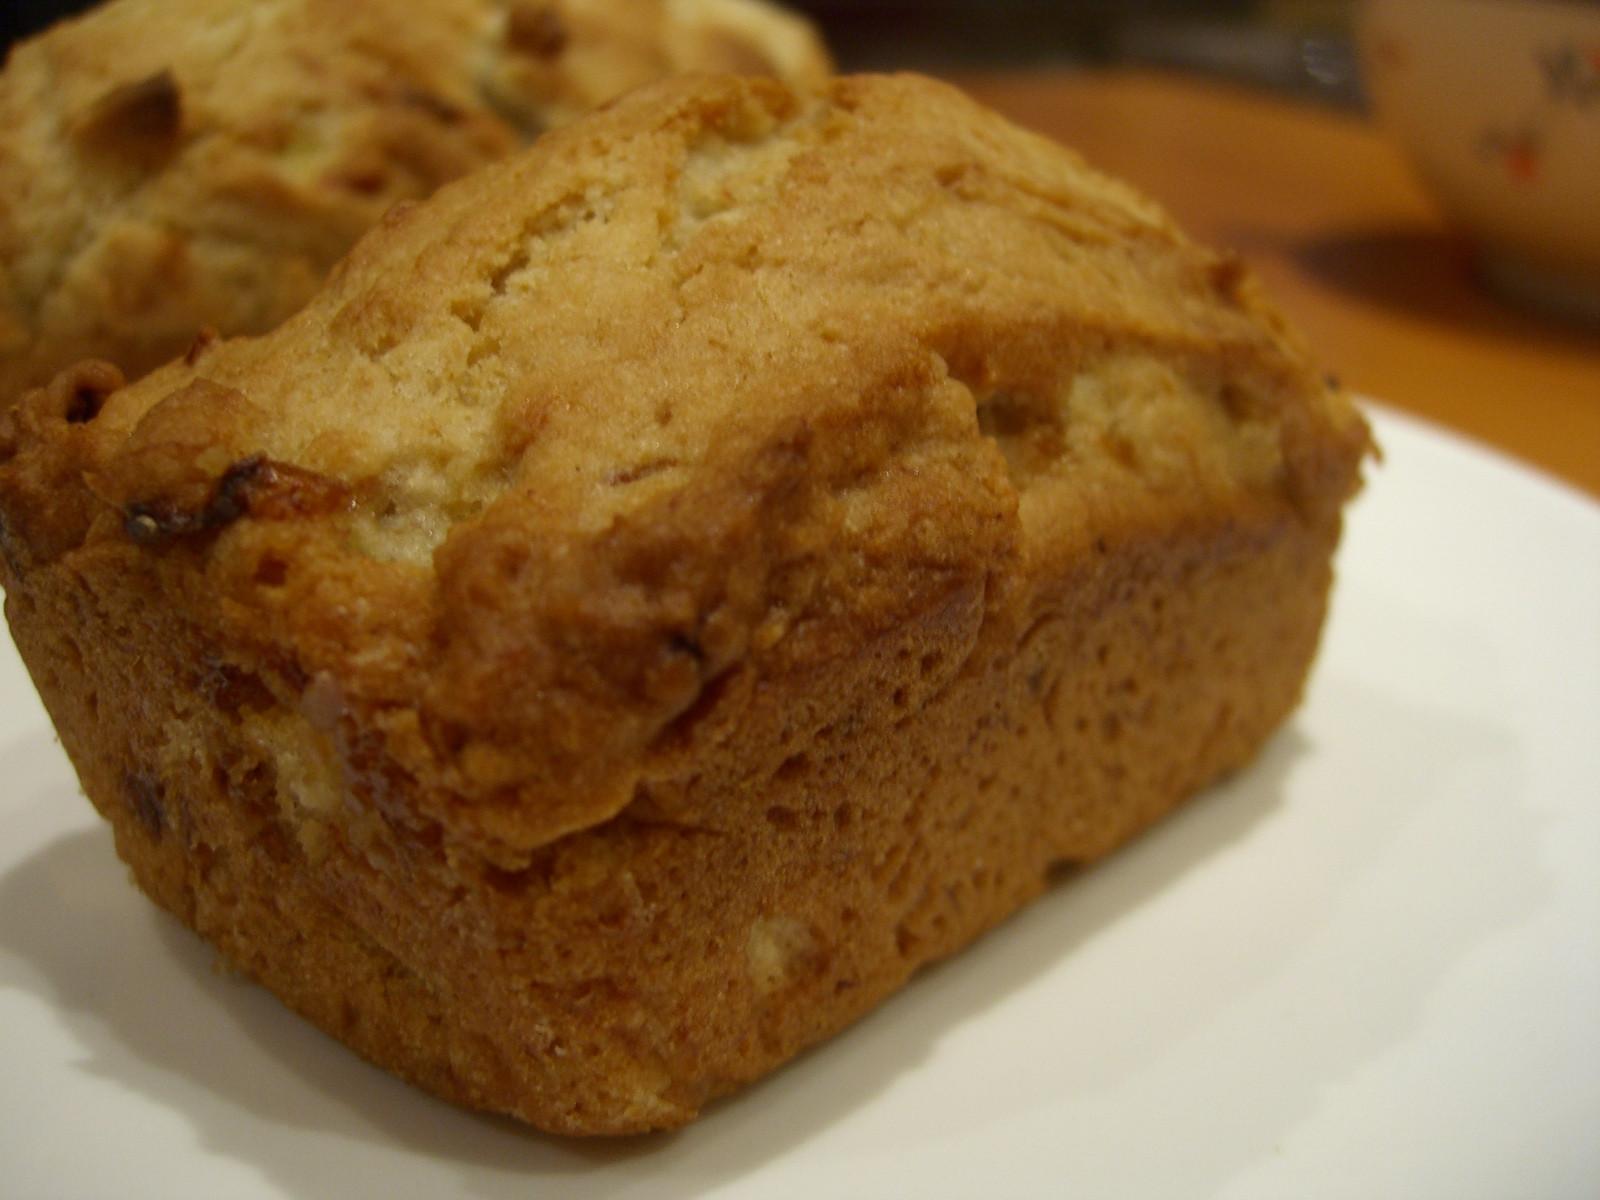 Weight Watchers Banana Recipes  Weight Watchers Healthy Banana Bread recipe BigOven